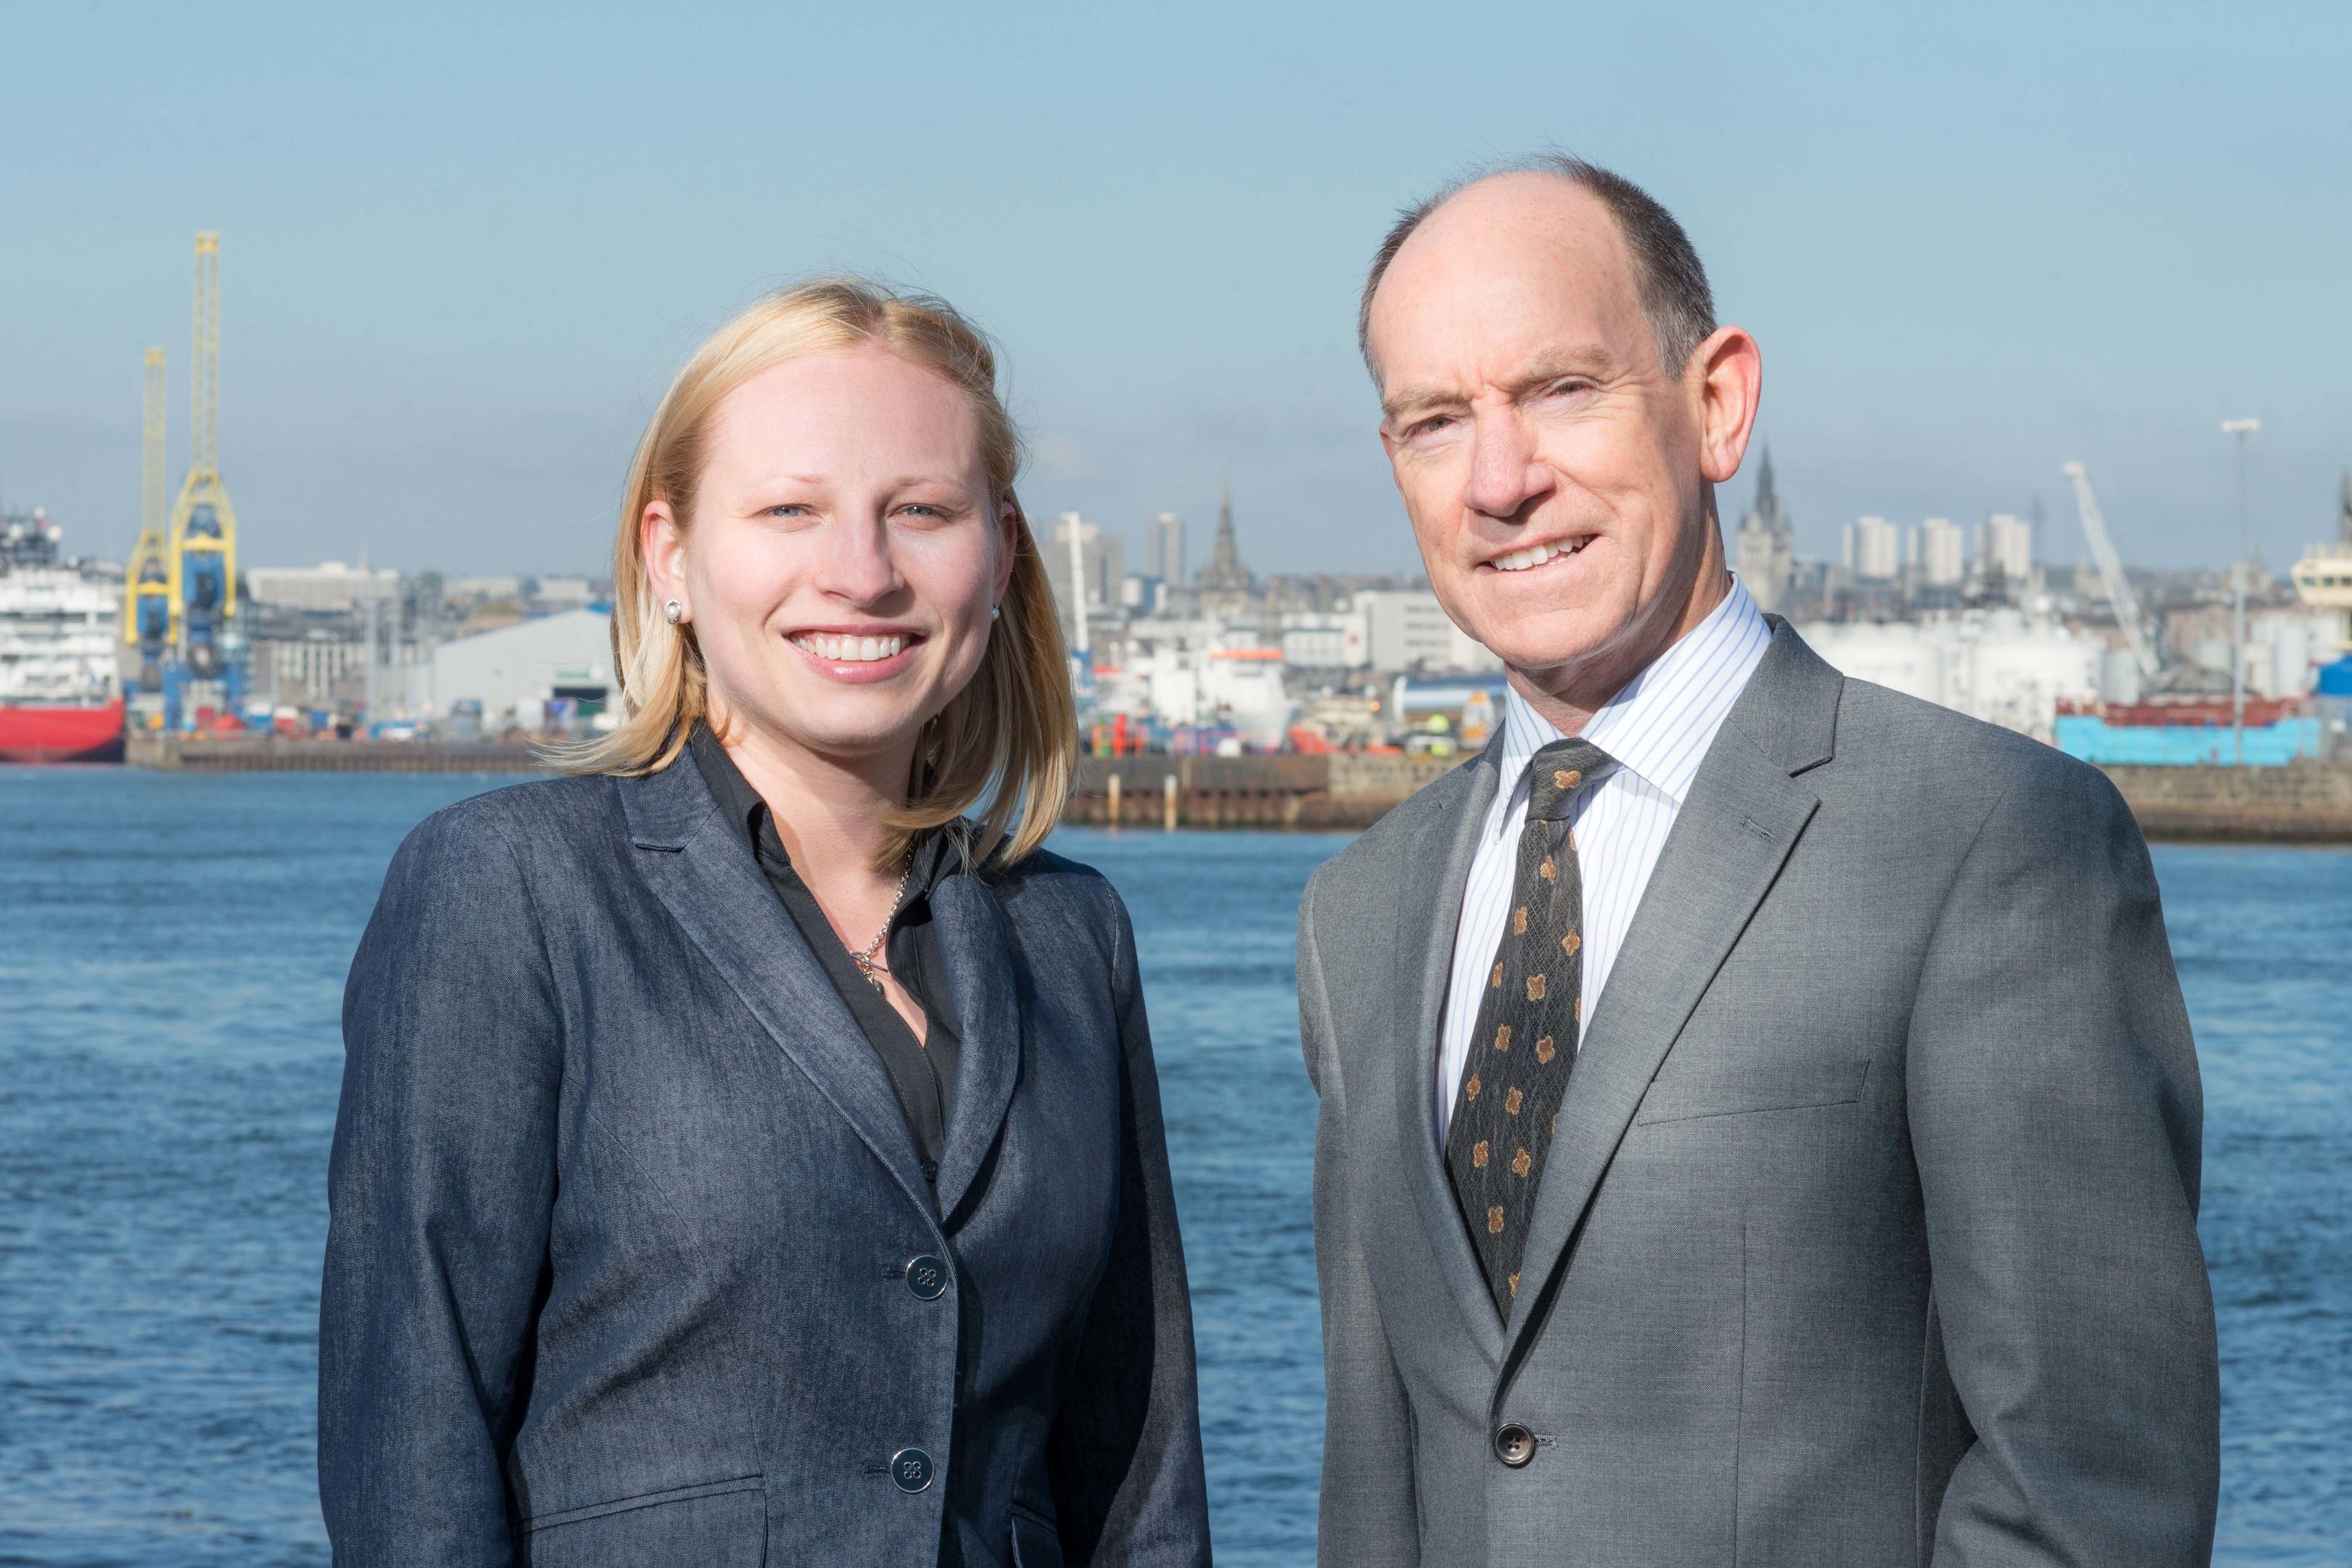 1CSI founders Aleksandra Tomaszek, chief operating officer and Matthew Kennedy, chief executive